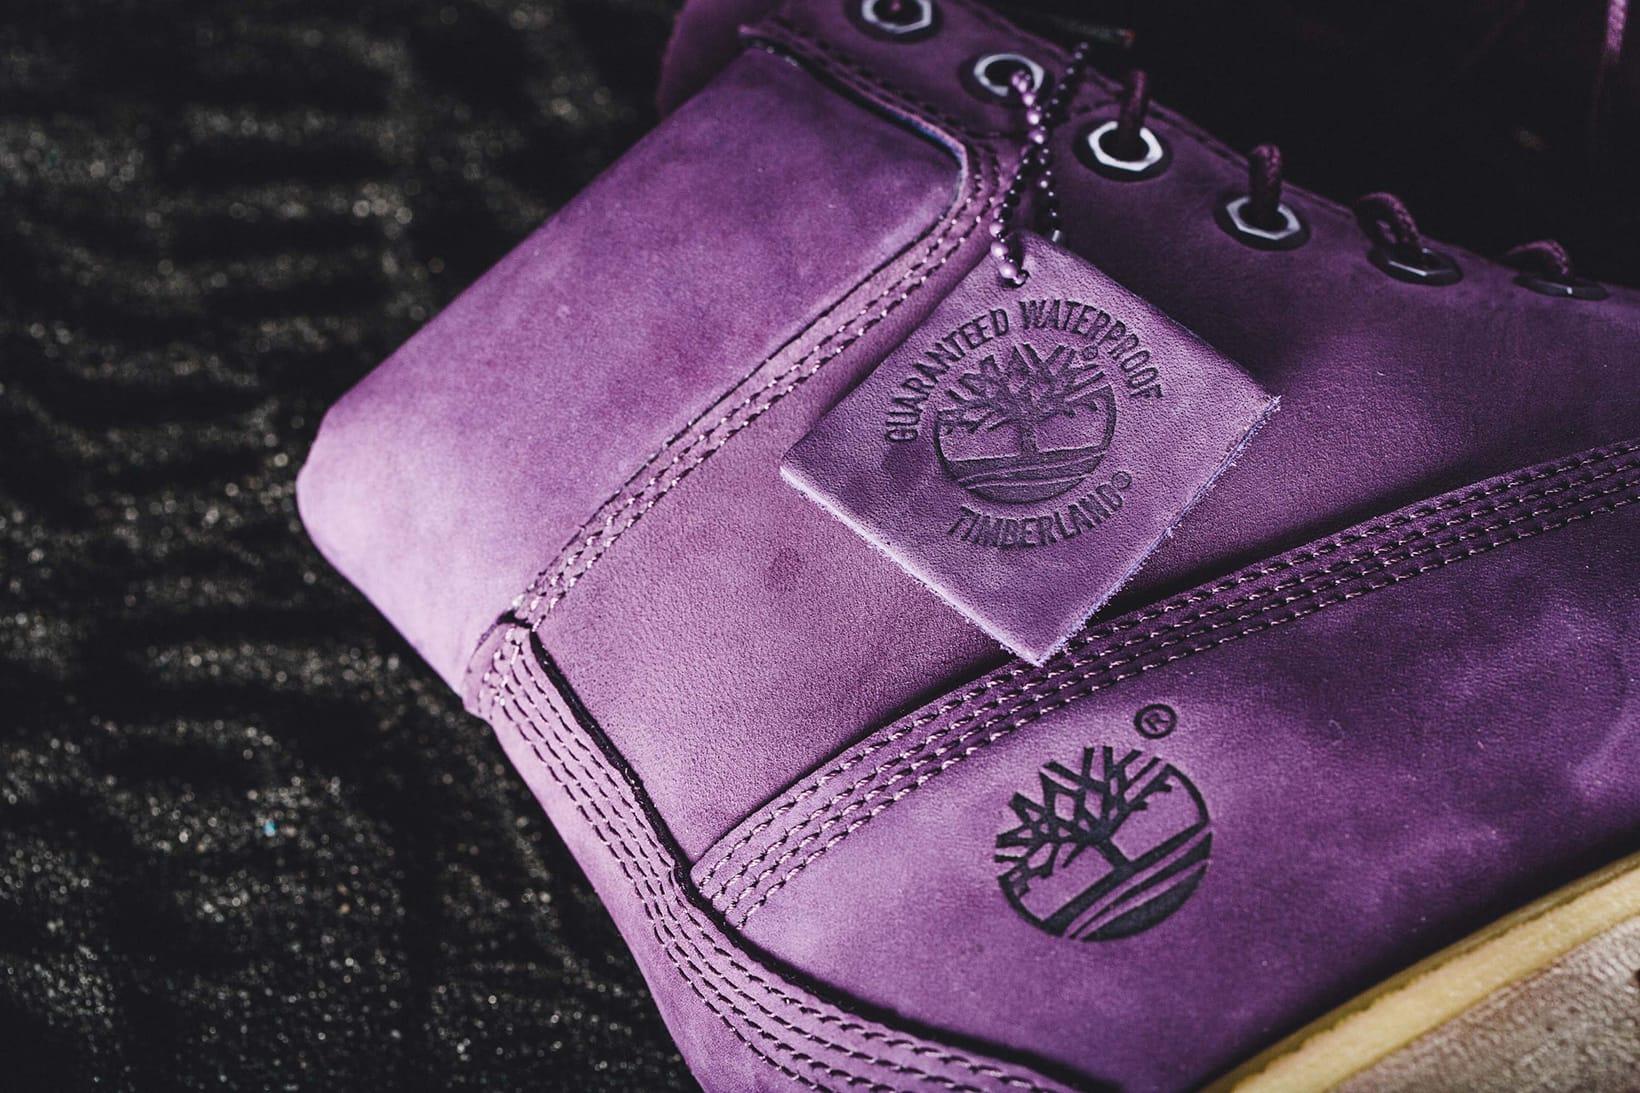 VILLA Timberland Purple Diamond Collabo